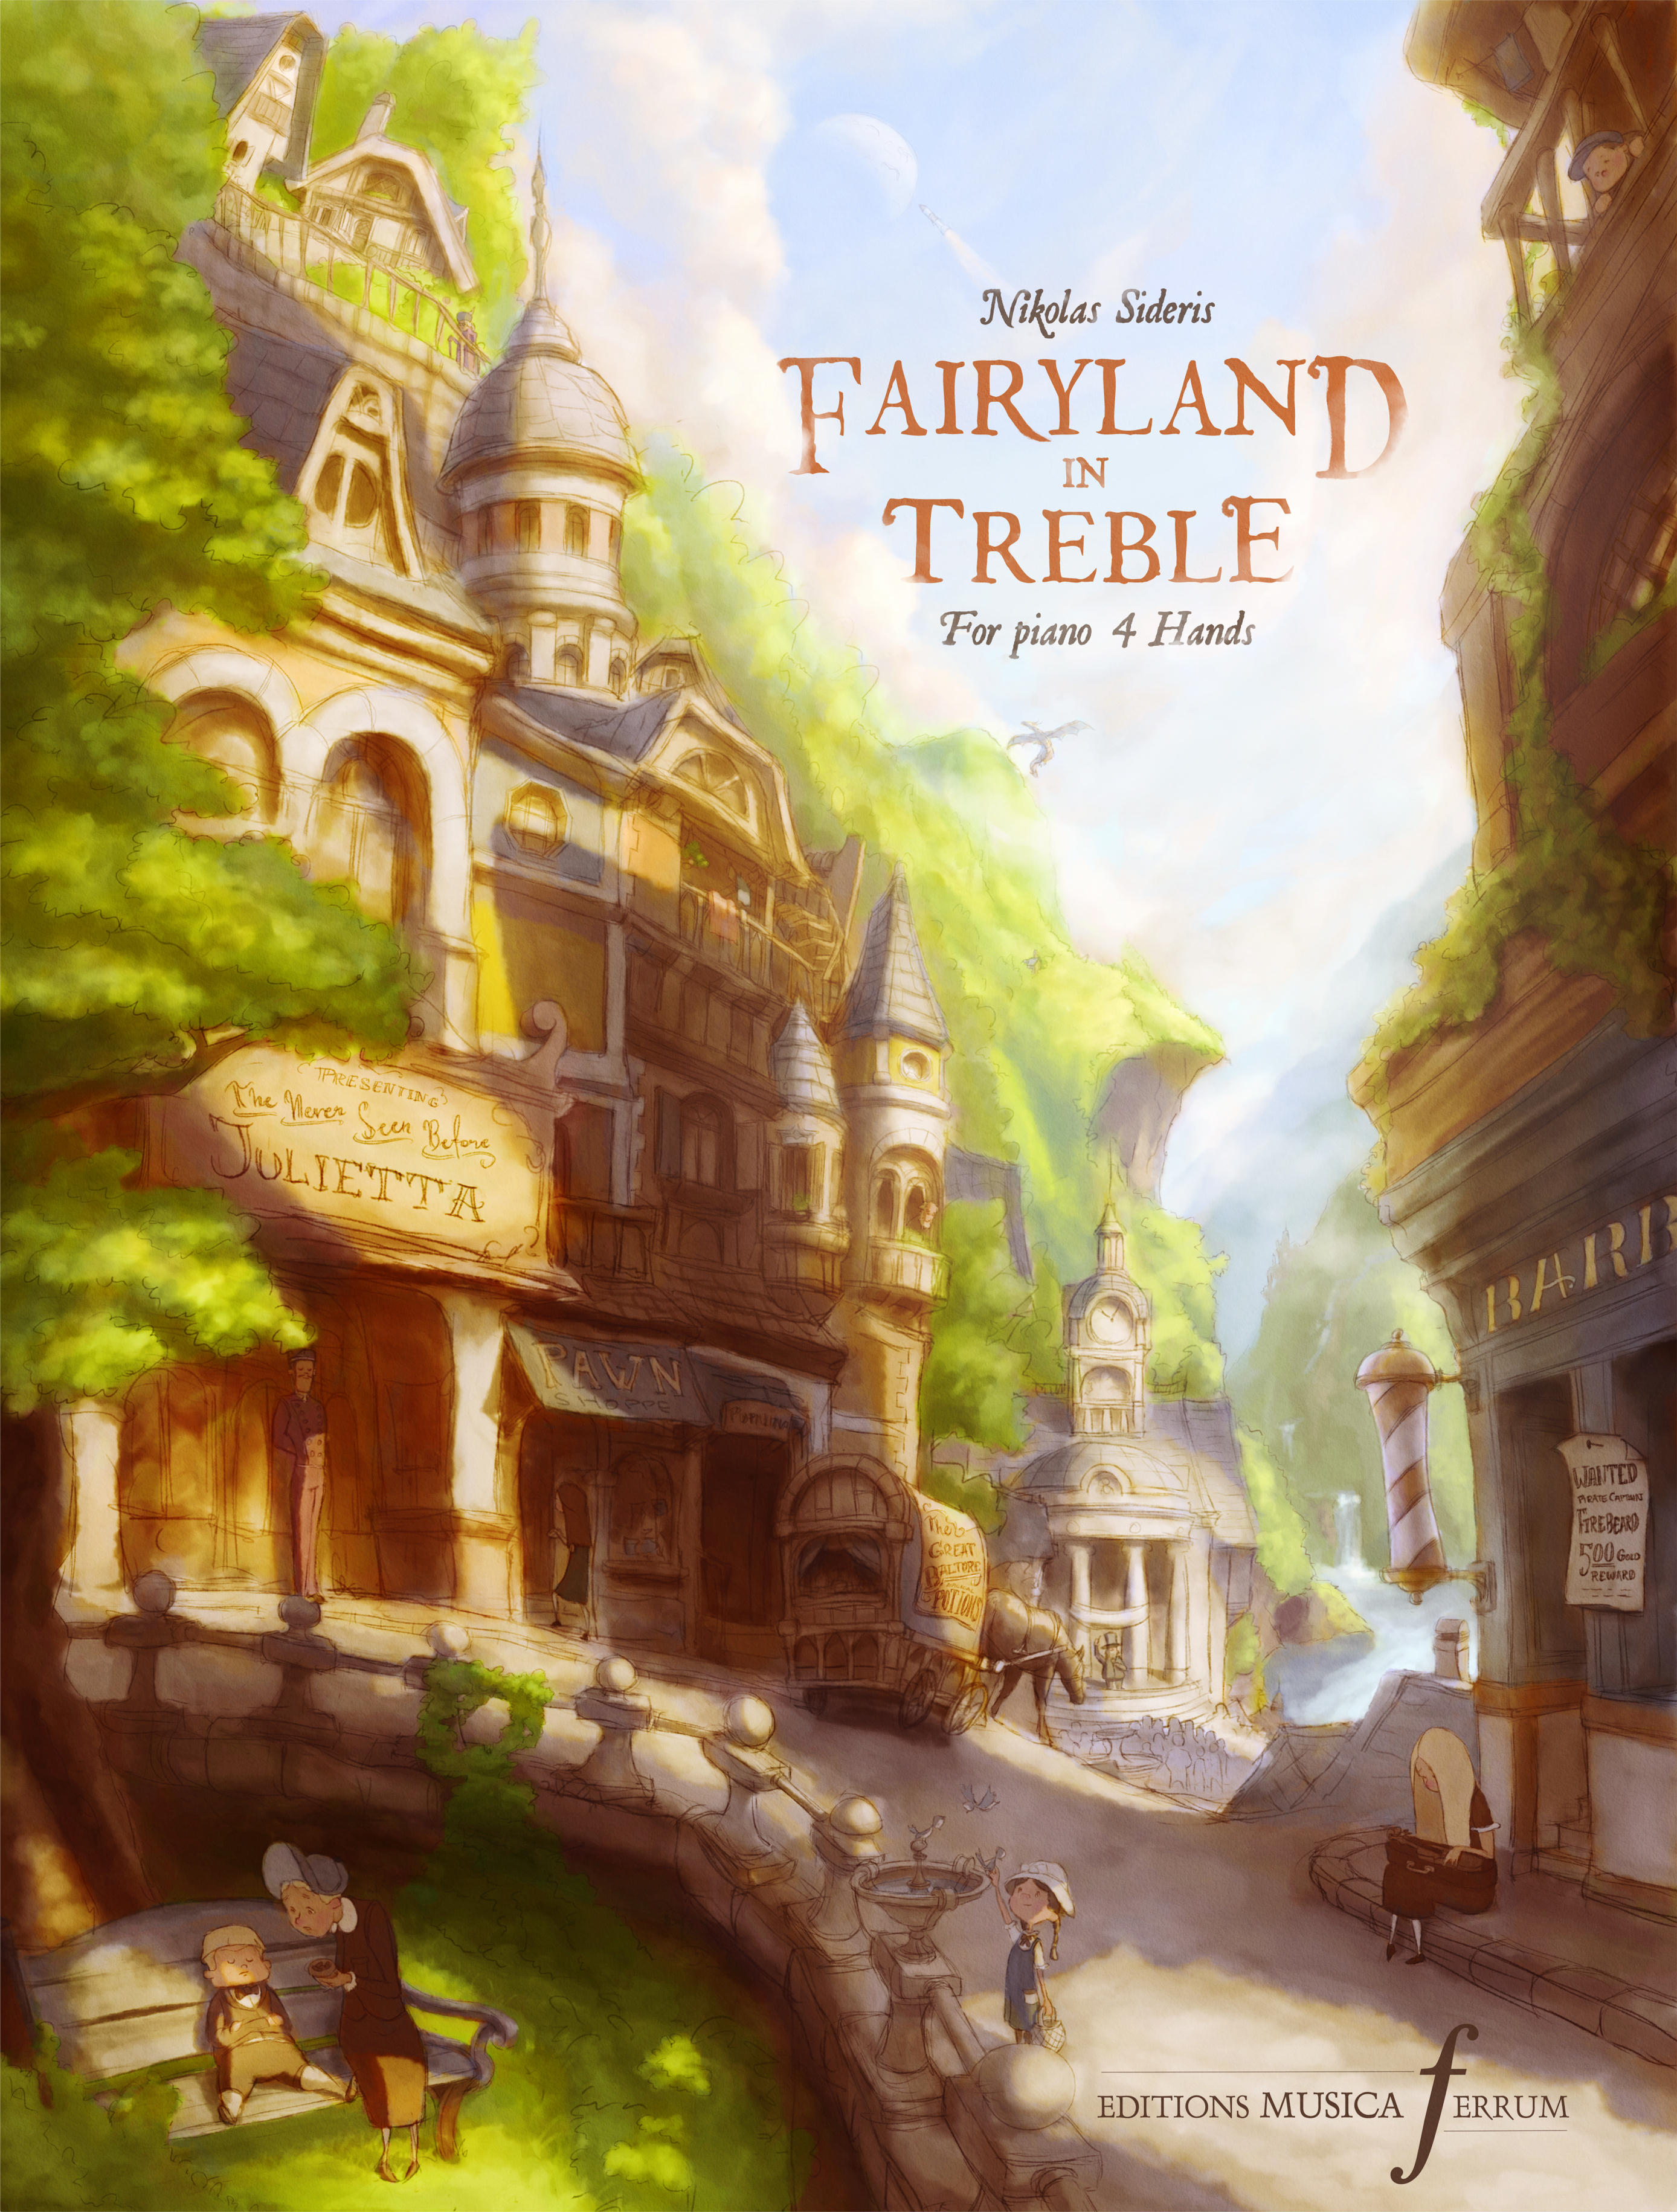 Fairyland in Treble